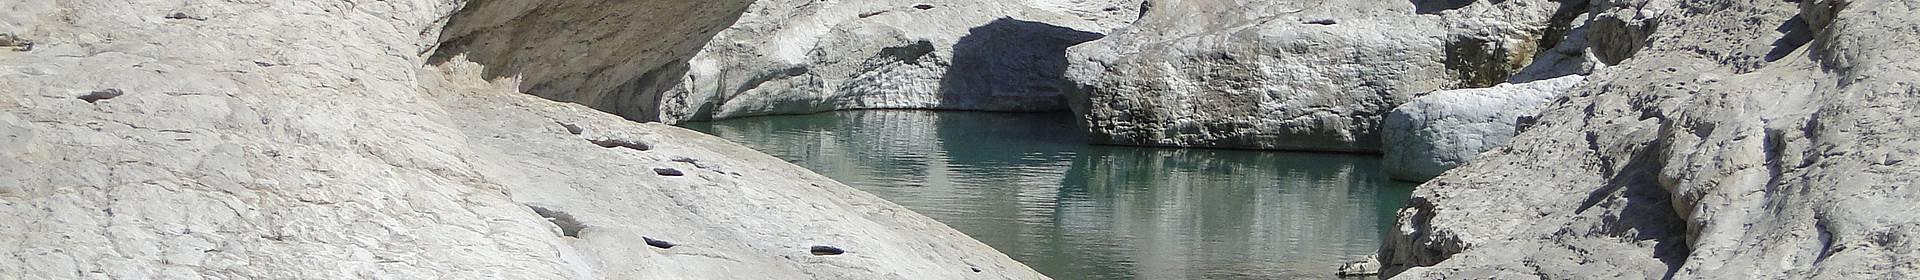 Wādī Banī Khālid